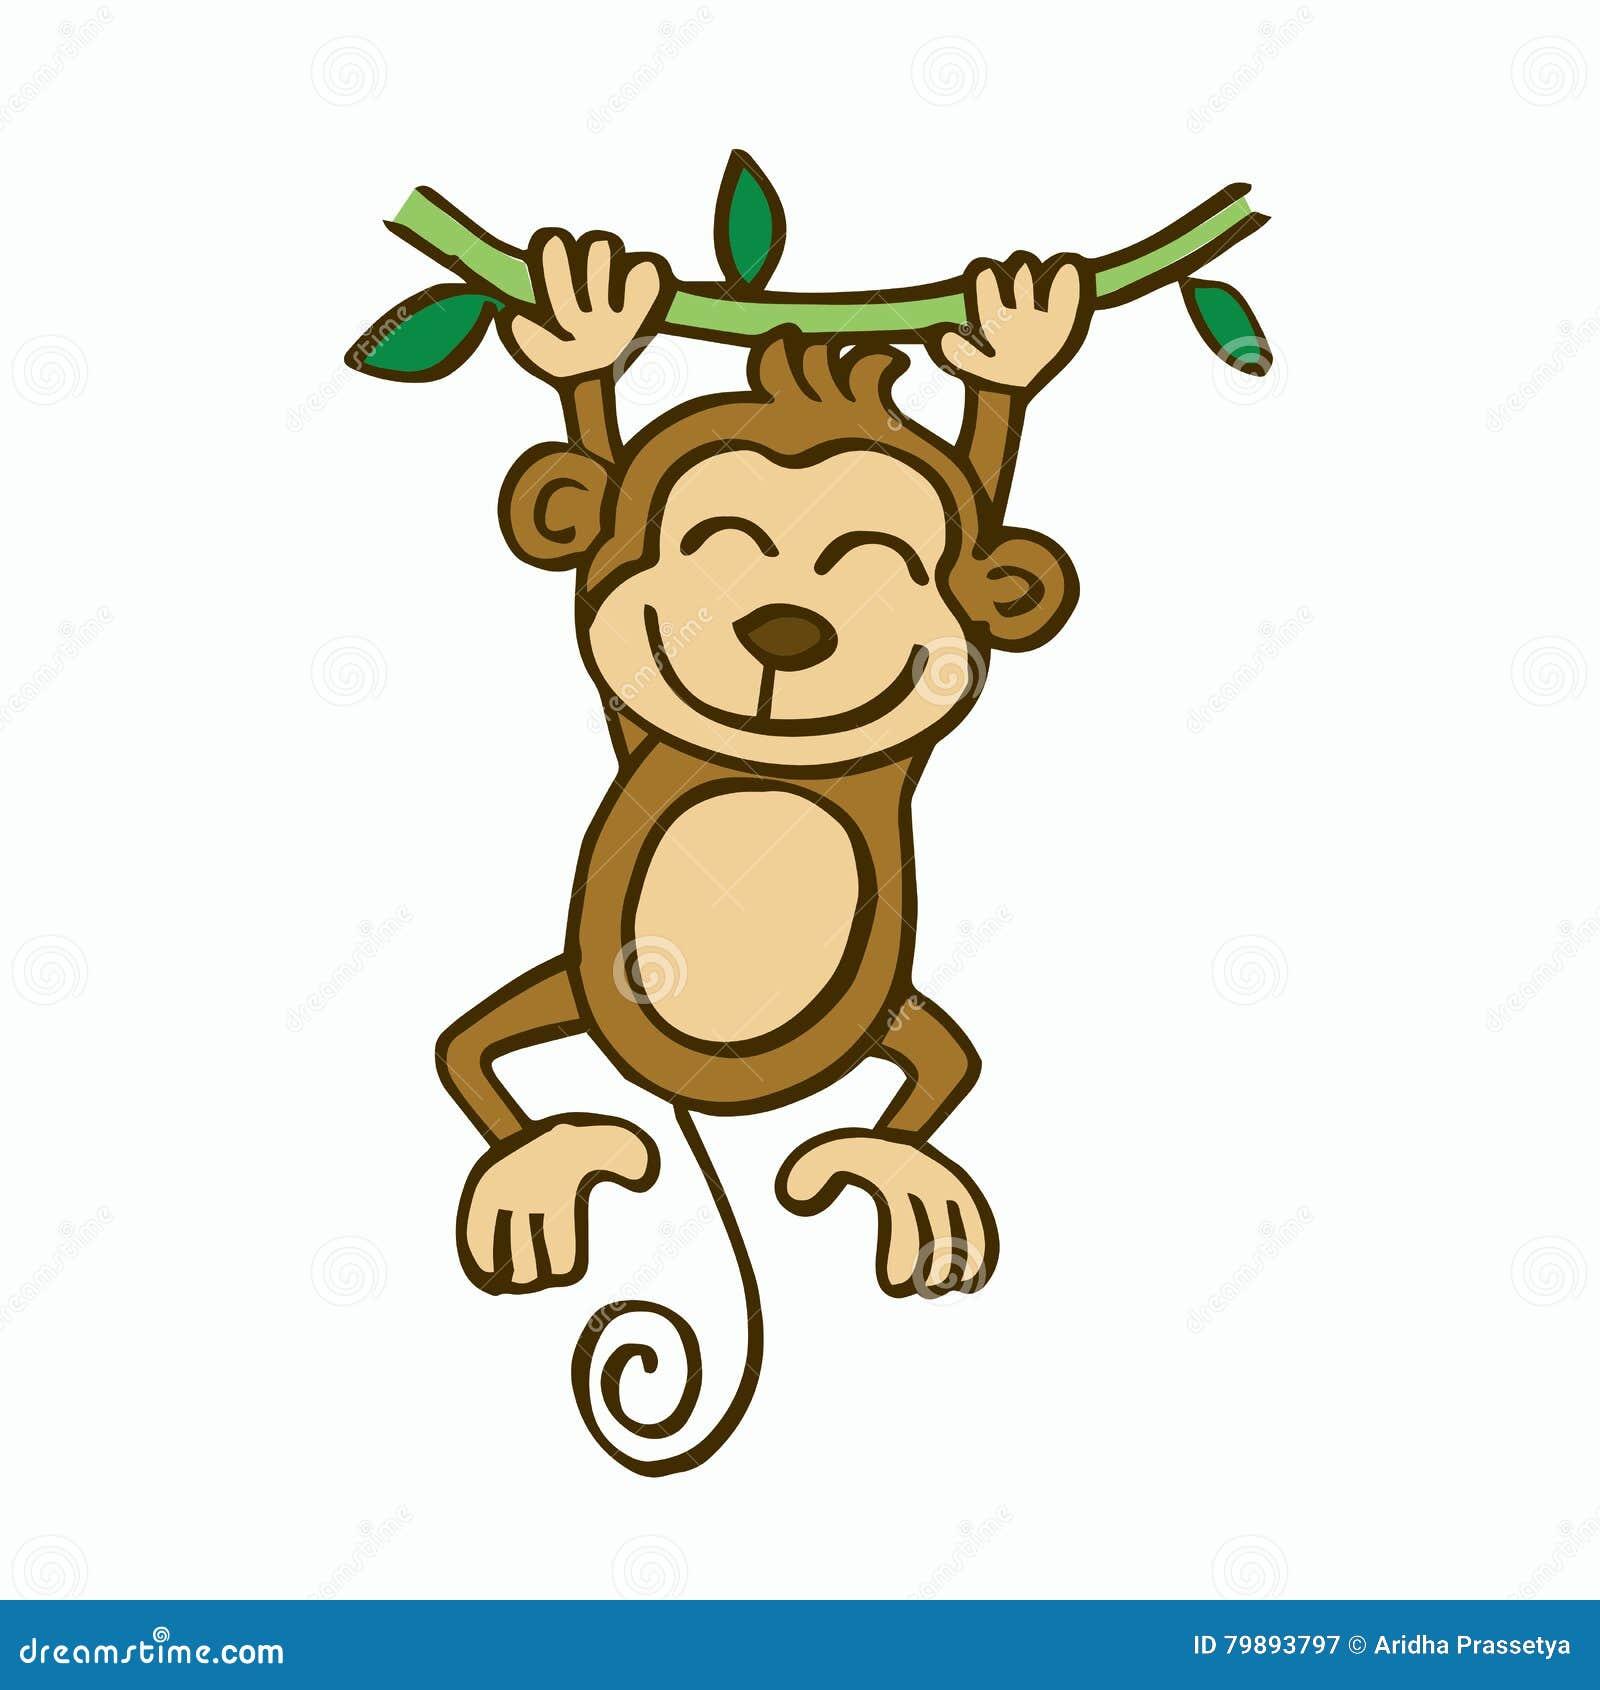 swinging monkey cartoon for kids stock vector - image: 79893797